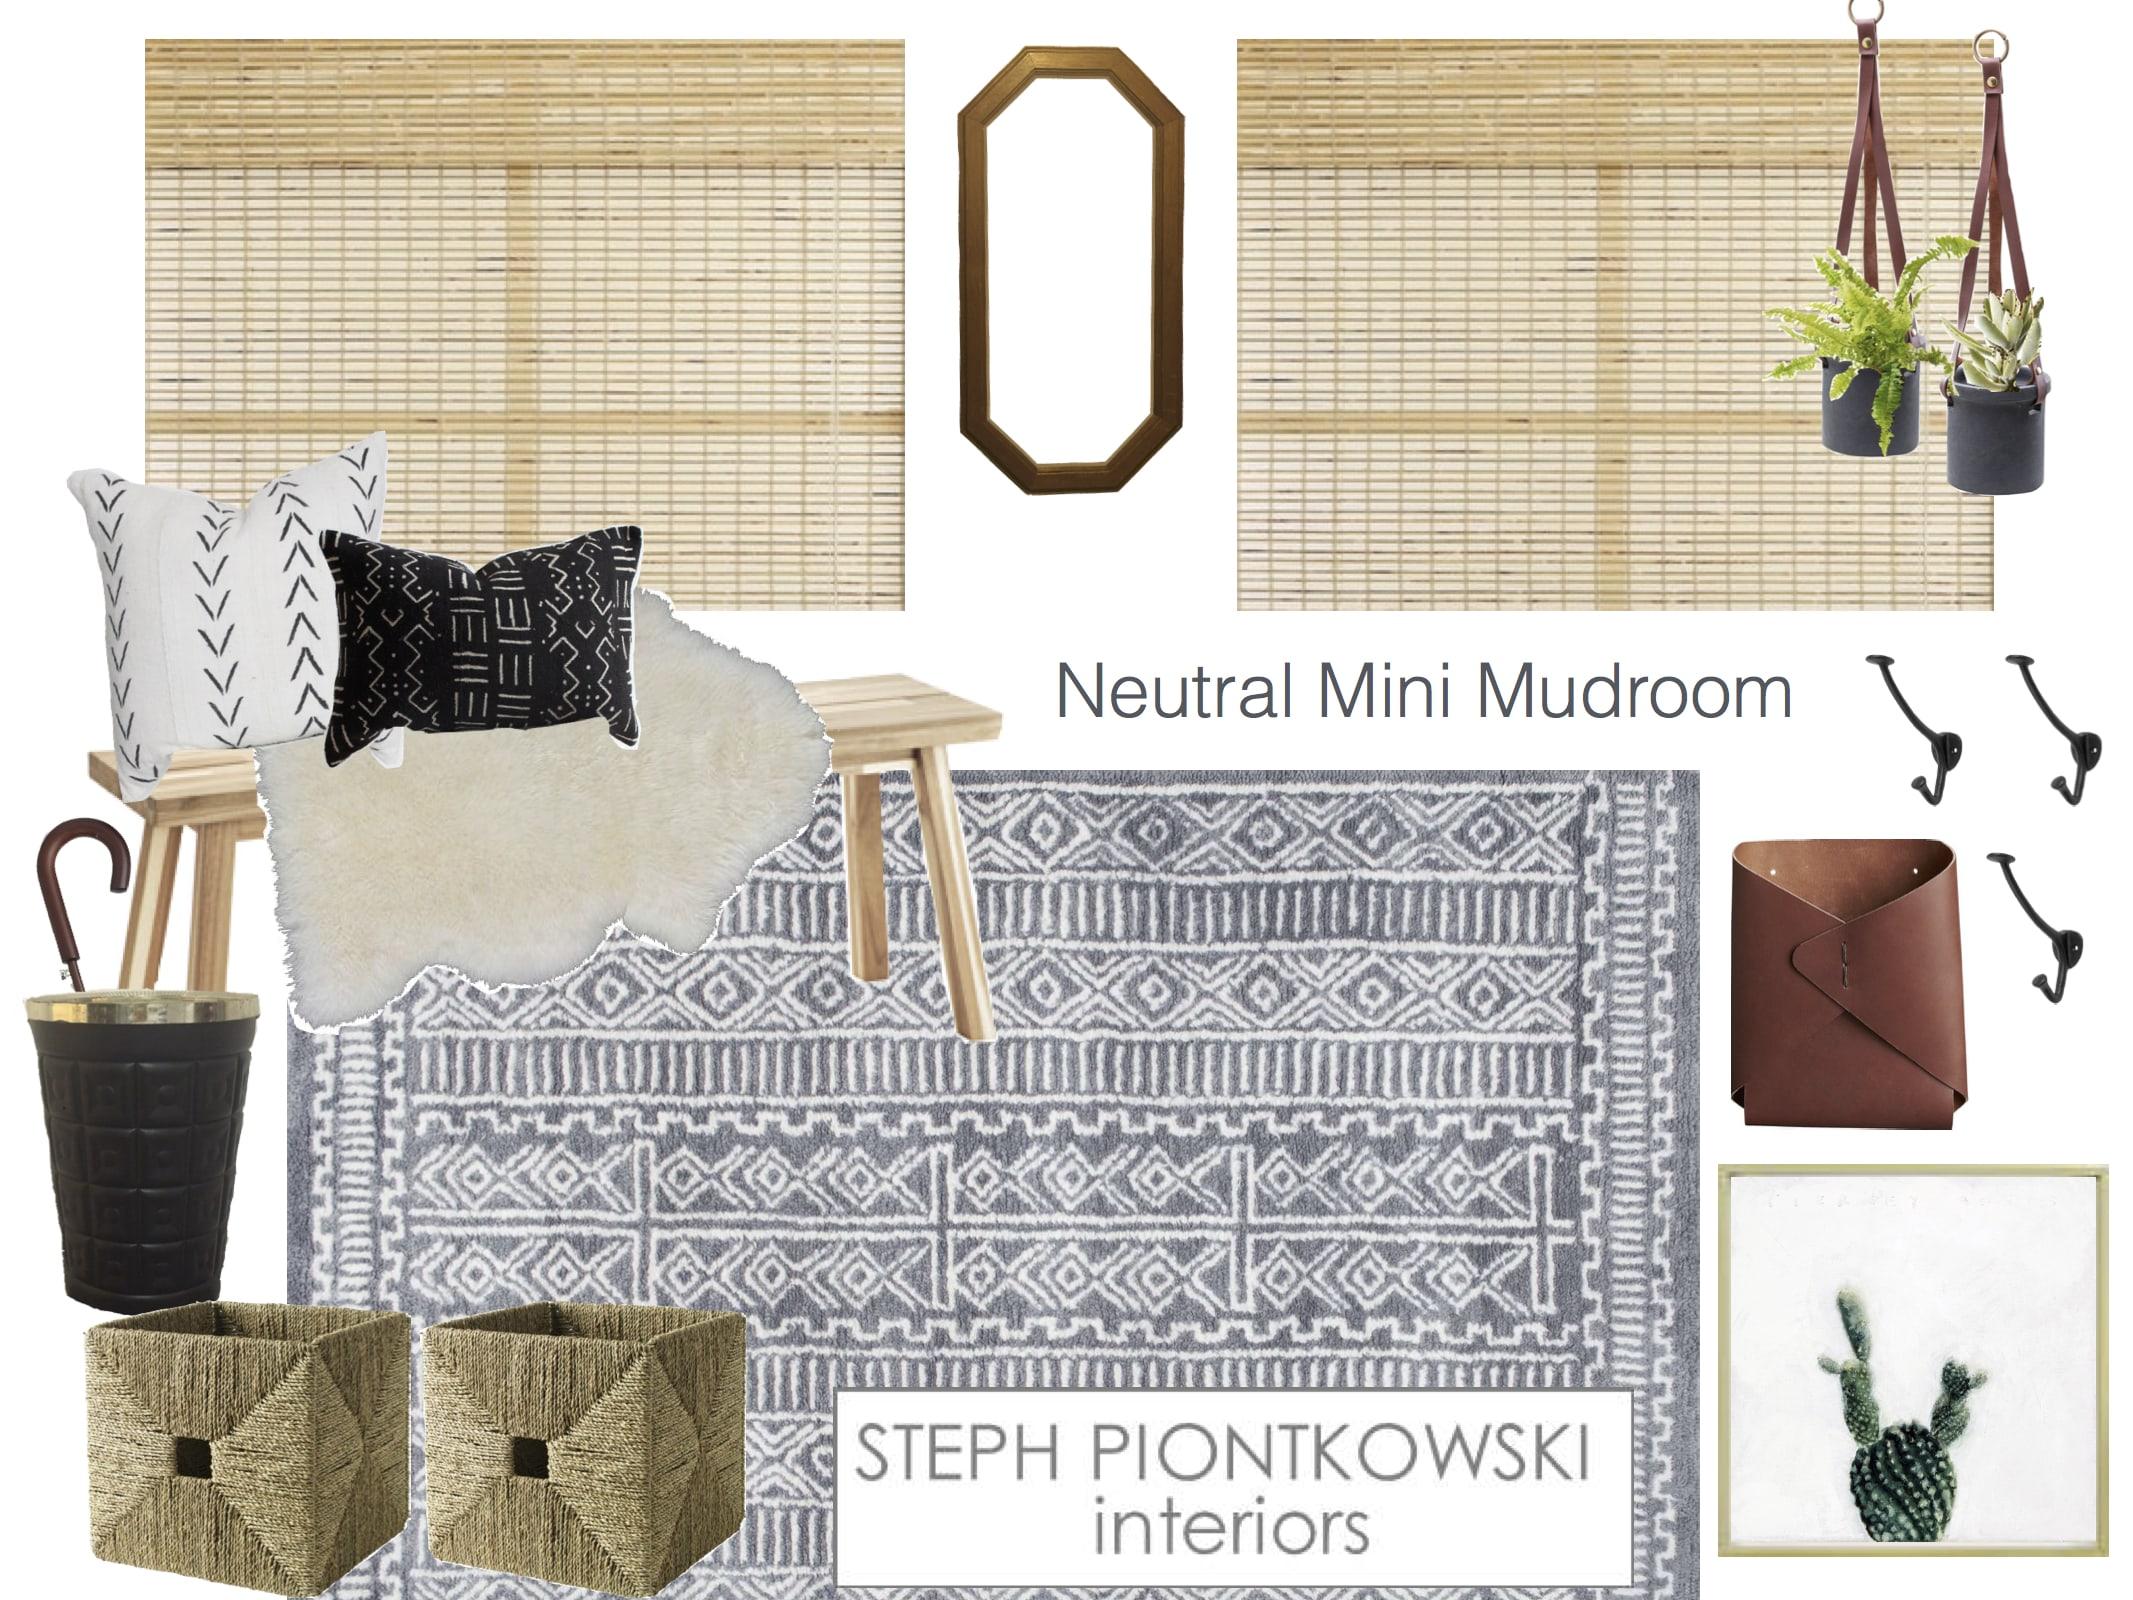 Neutral Mini Mudroom | STEPH PIONTKOWSKI INTERIORS